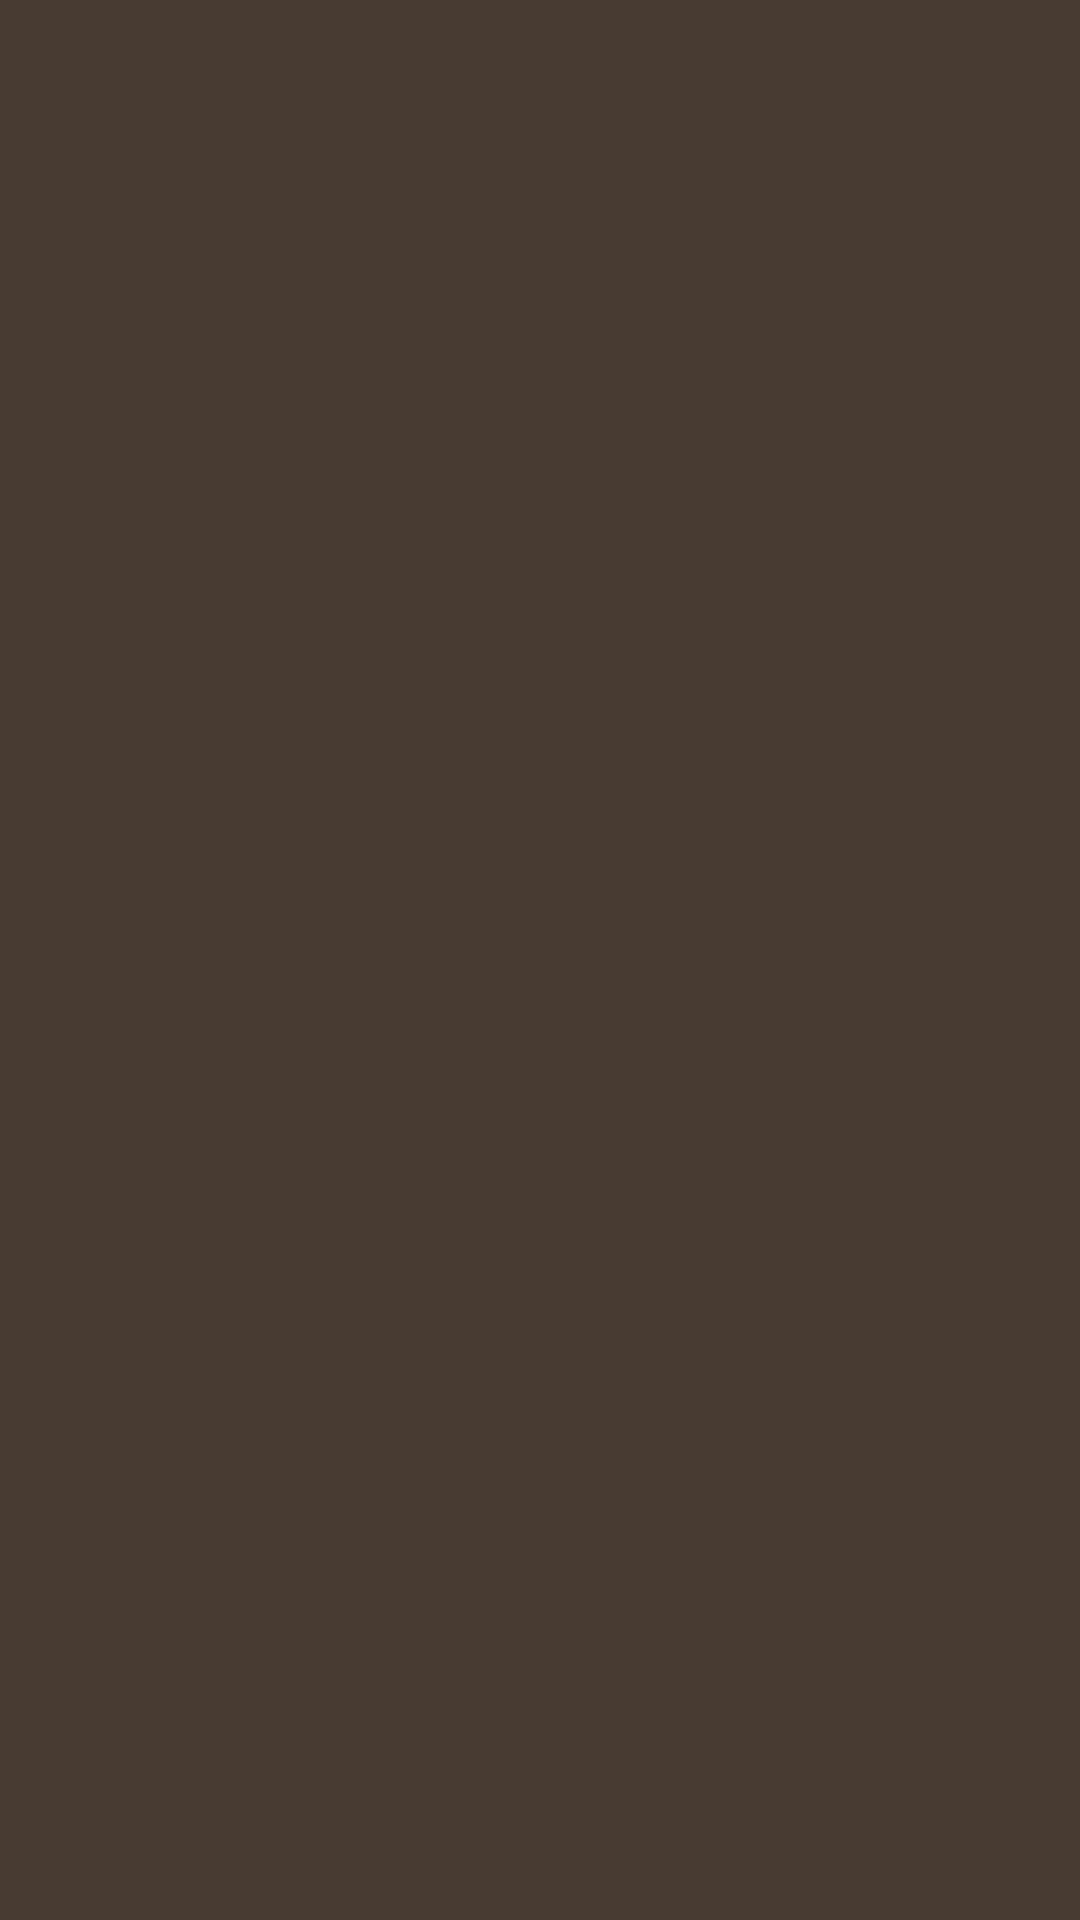 1080x1920 Dark Lava Solid Color Background